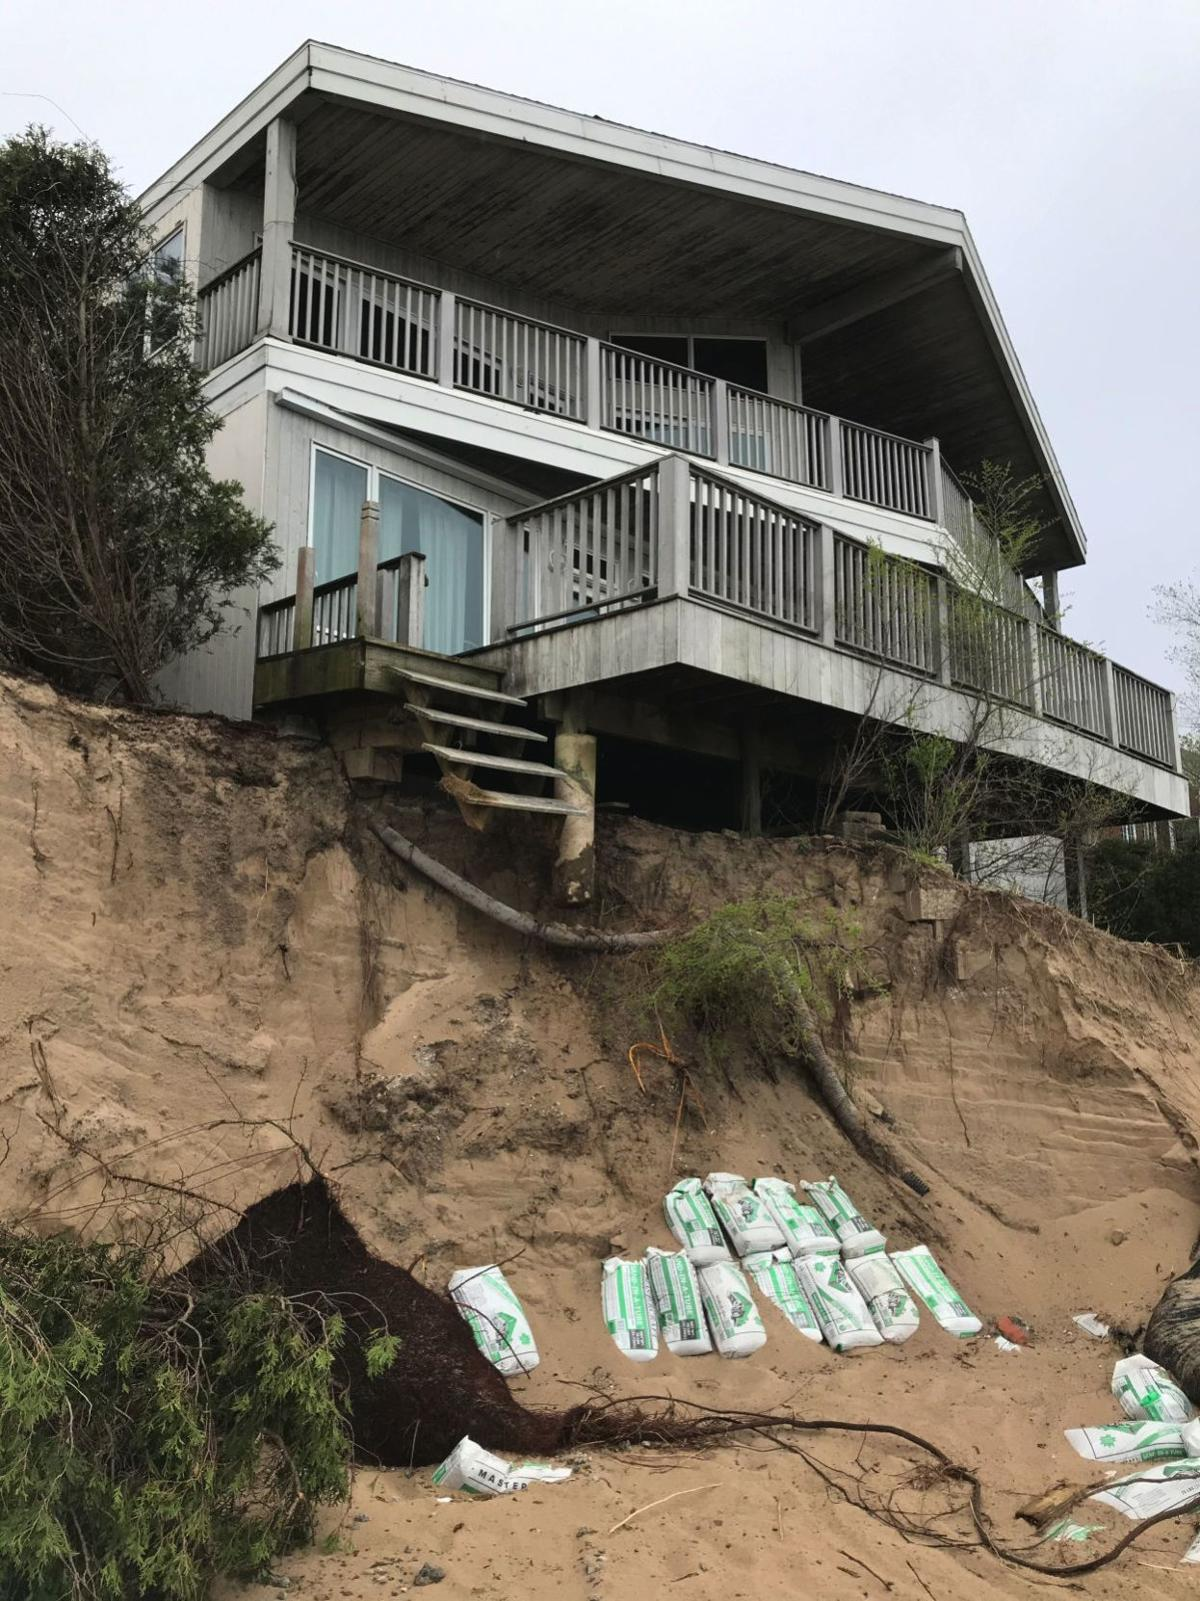 Ogden Dunes beach erosion